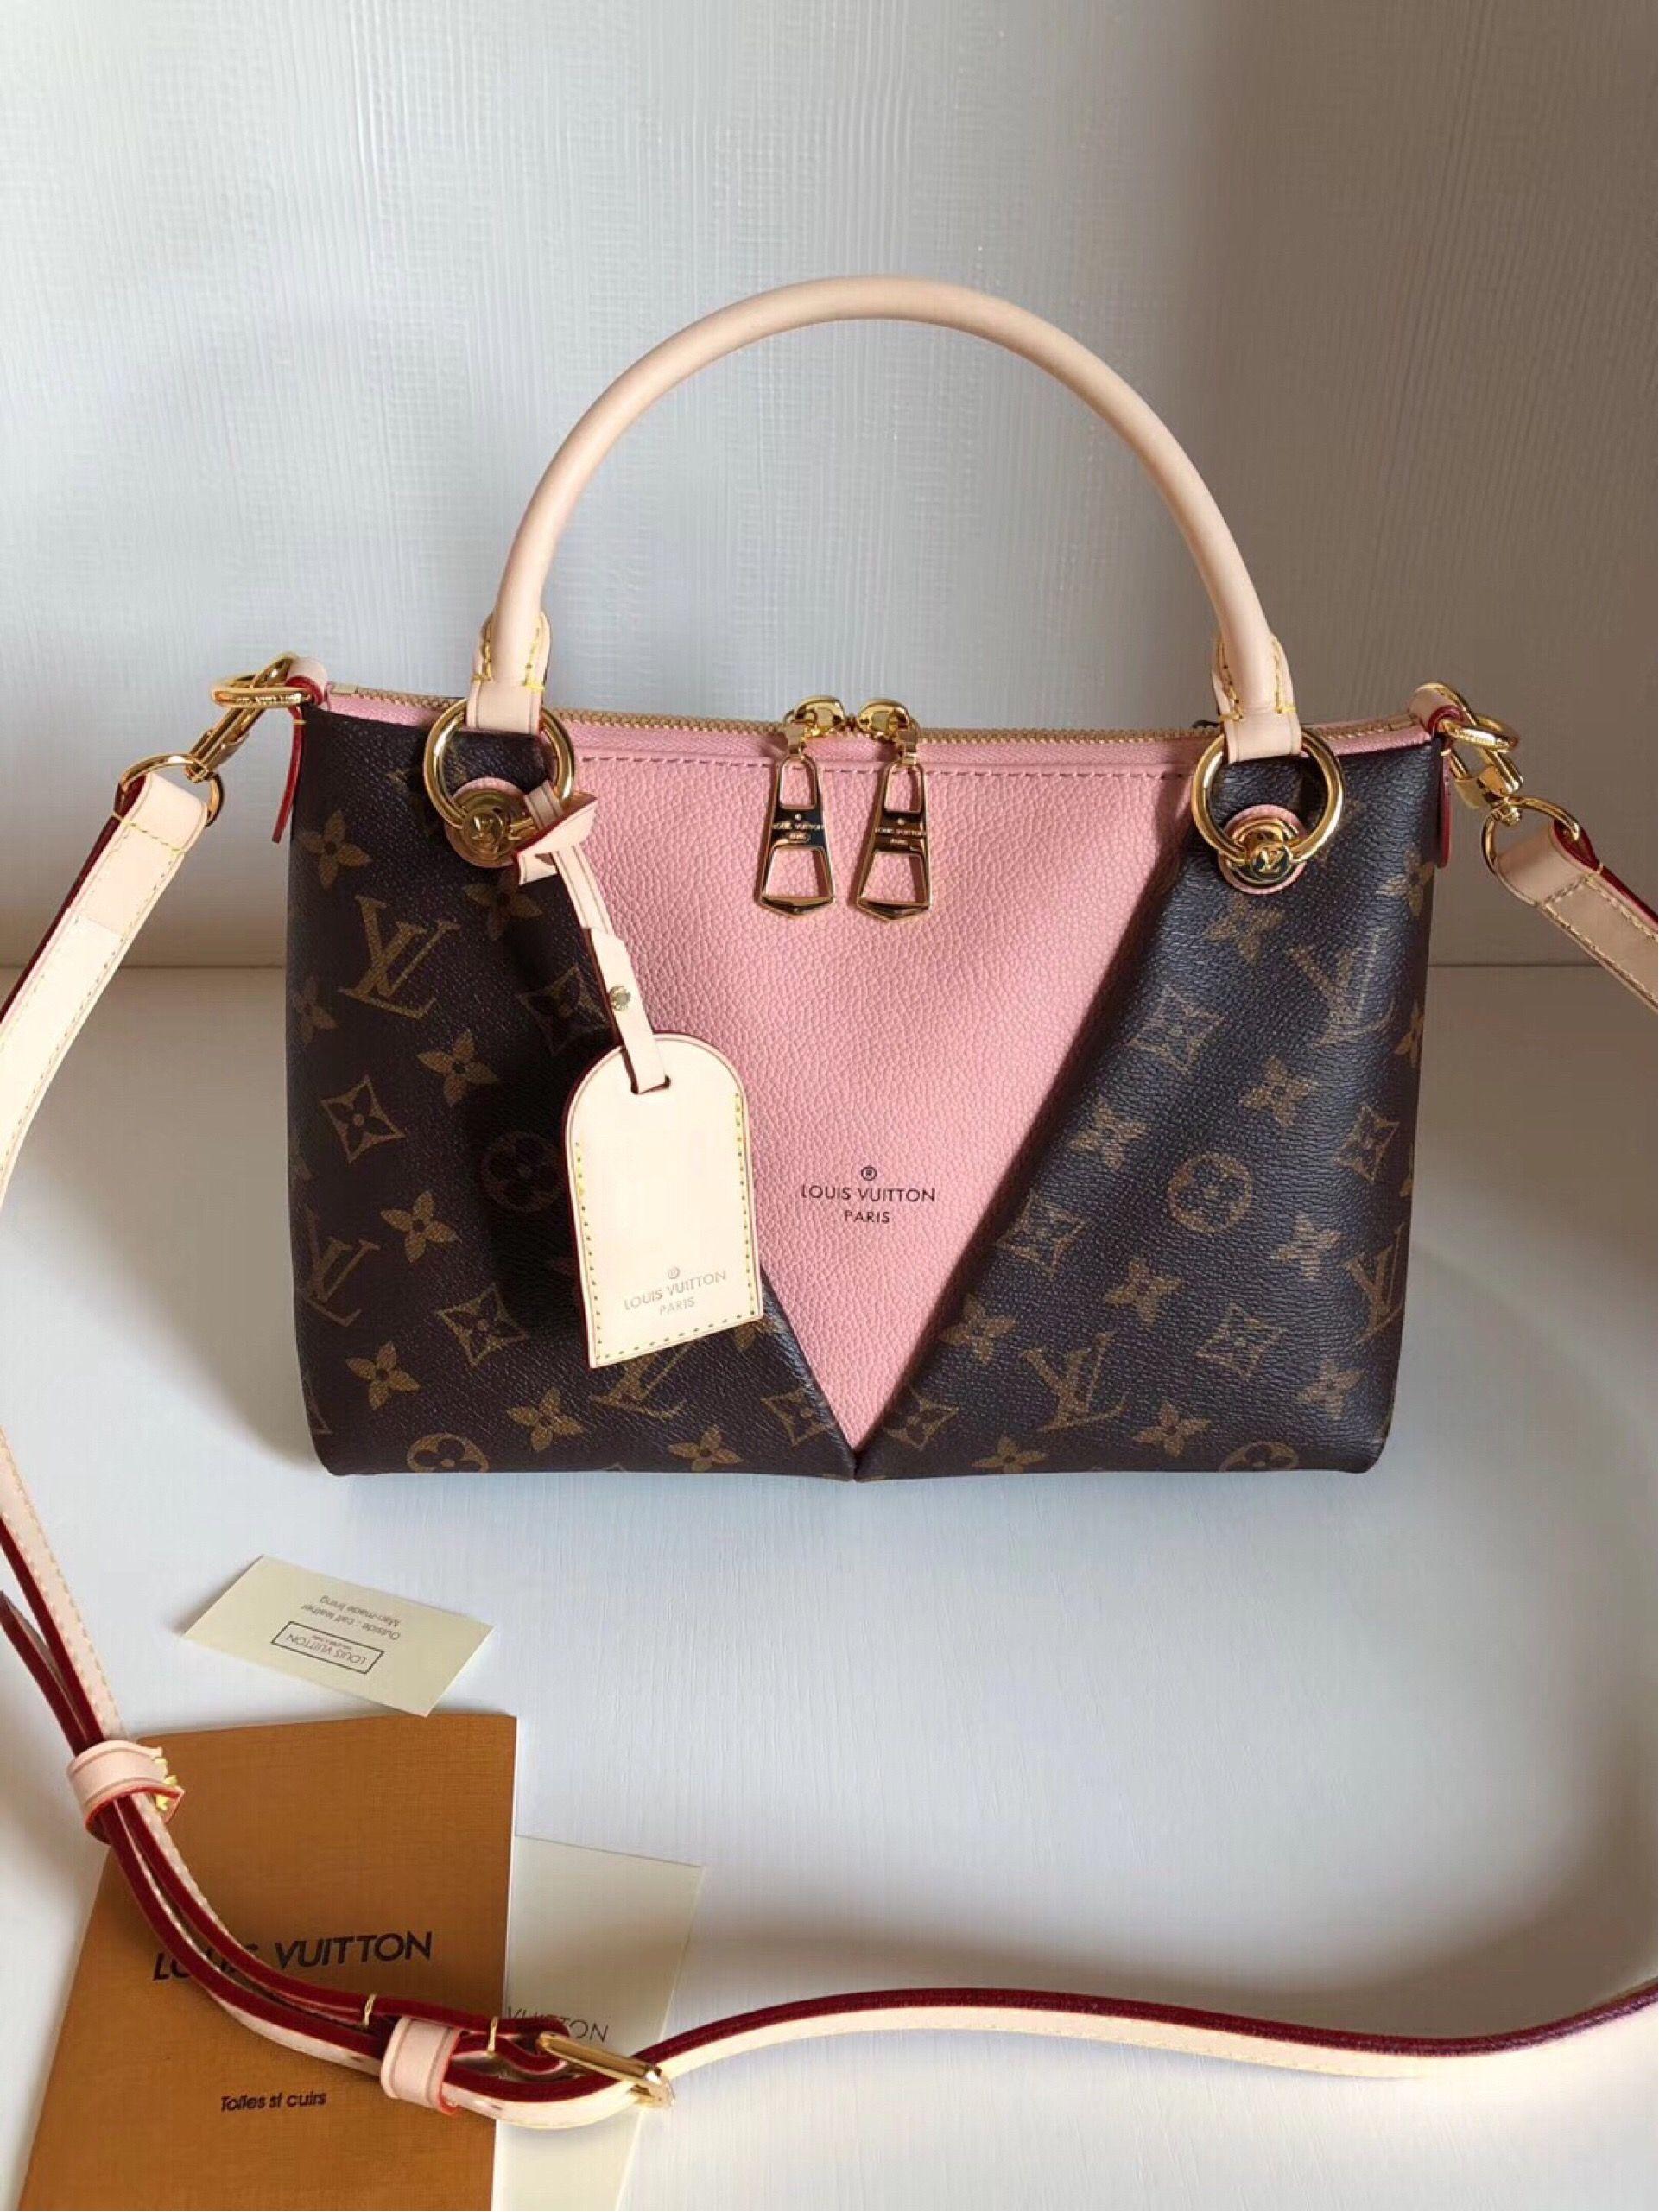 bf6a4817cf82 Louis Vuitton V Tote Bag M43967 Rose  louis vuitton v tote bag  louis   vuitton  v  tote bag  lv tote bag  lv tote purses  lv tote